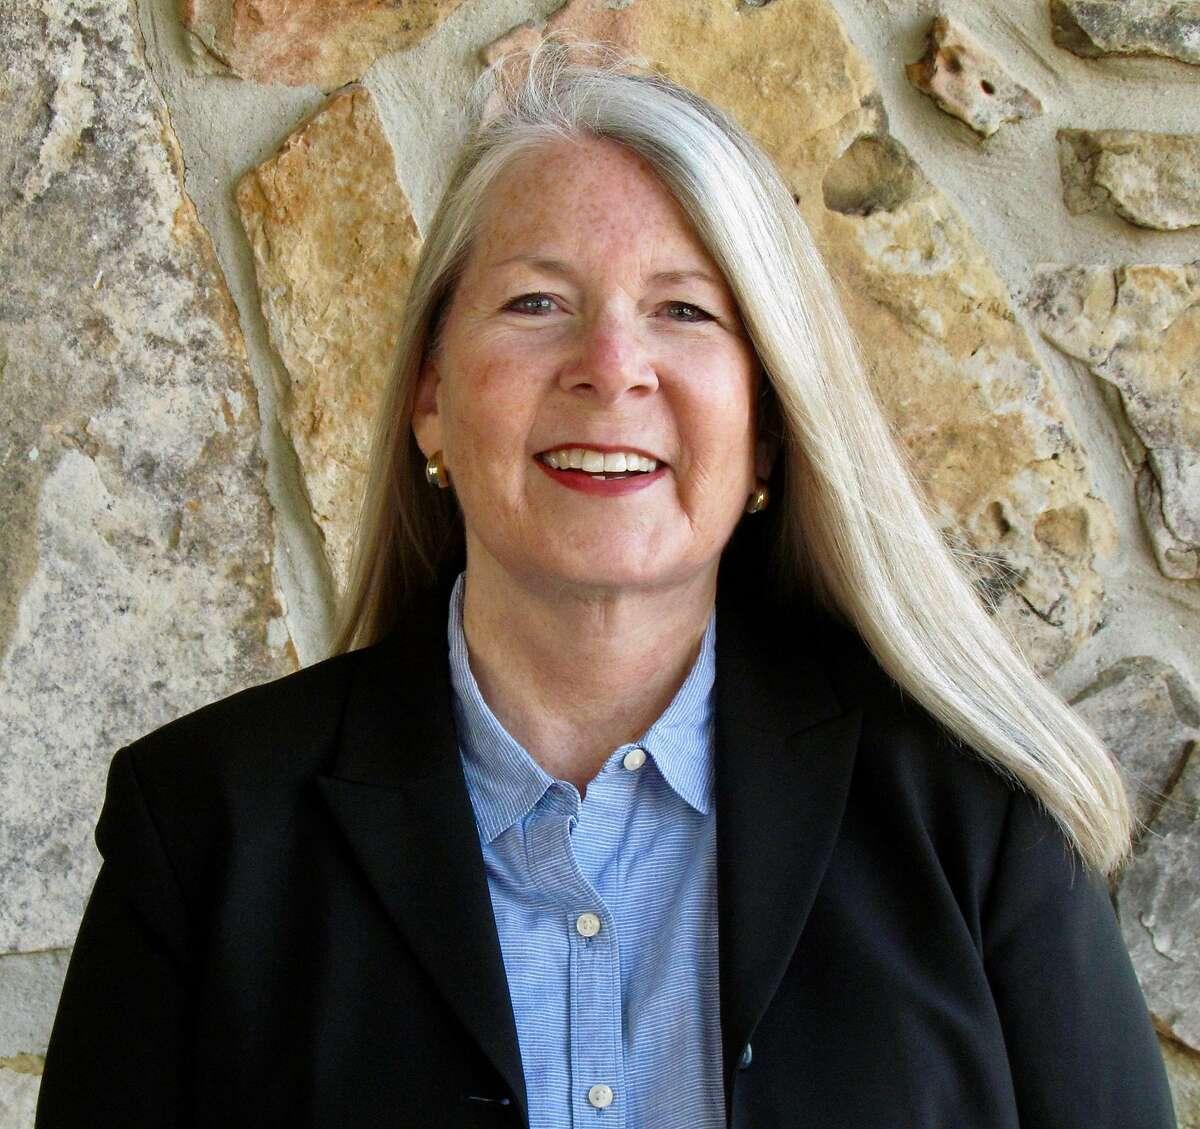 Liz Bayer